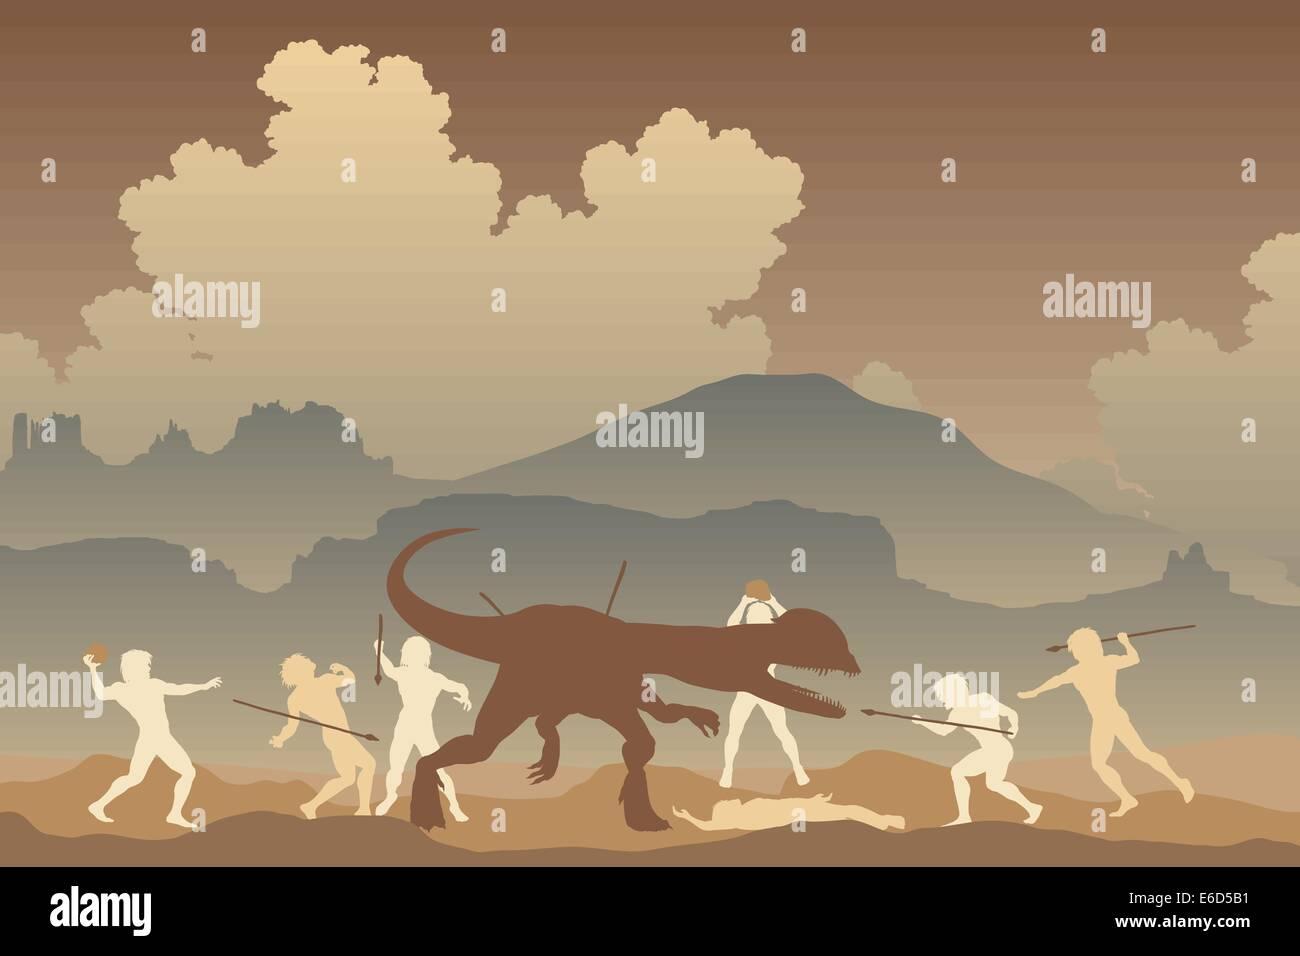 Editable vector illustration of cavemen fighting a Dilophosaurus dinosaur in a primeval landscape - Stock Vector